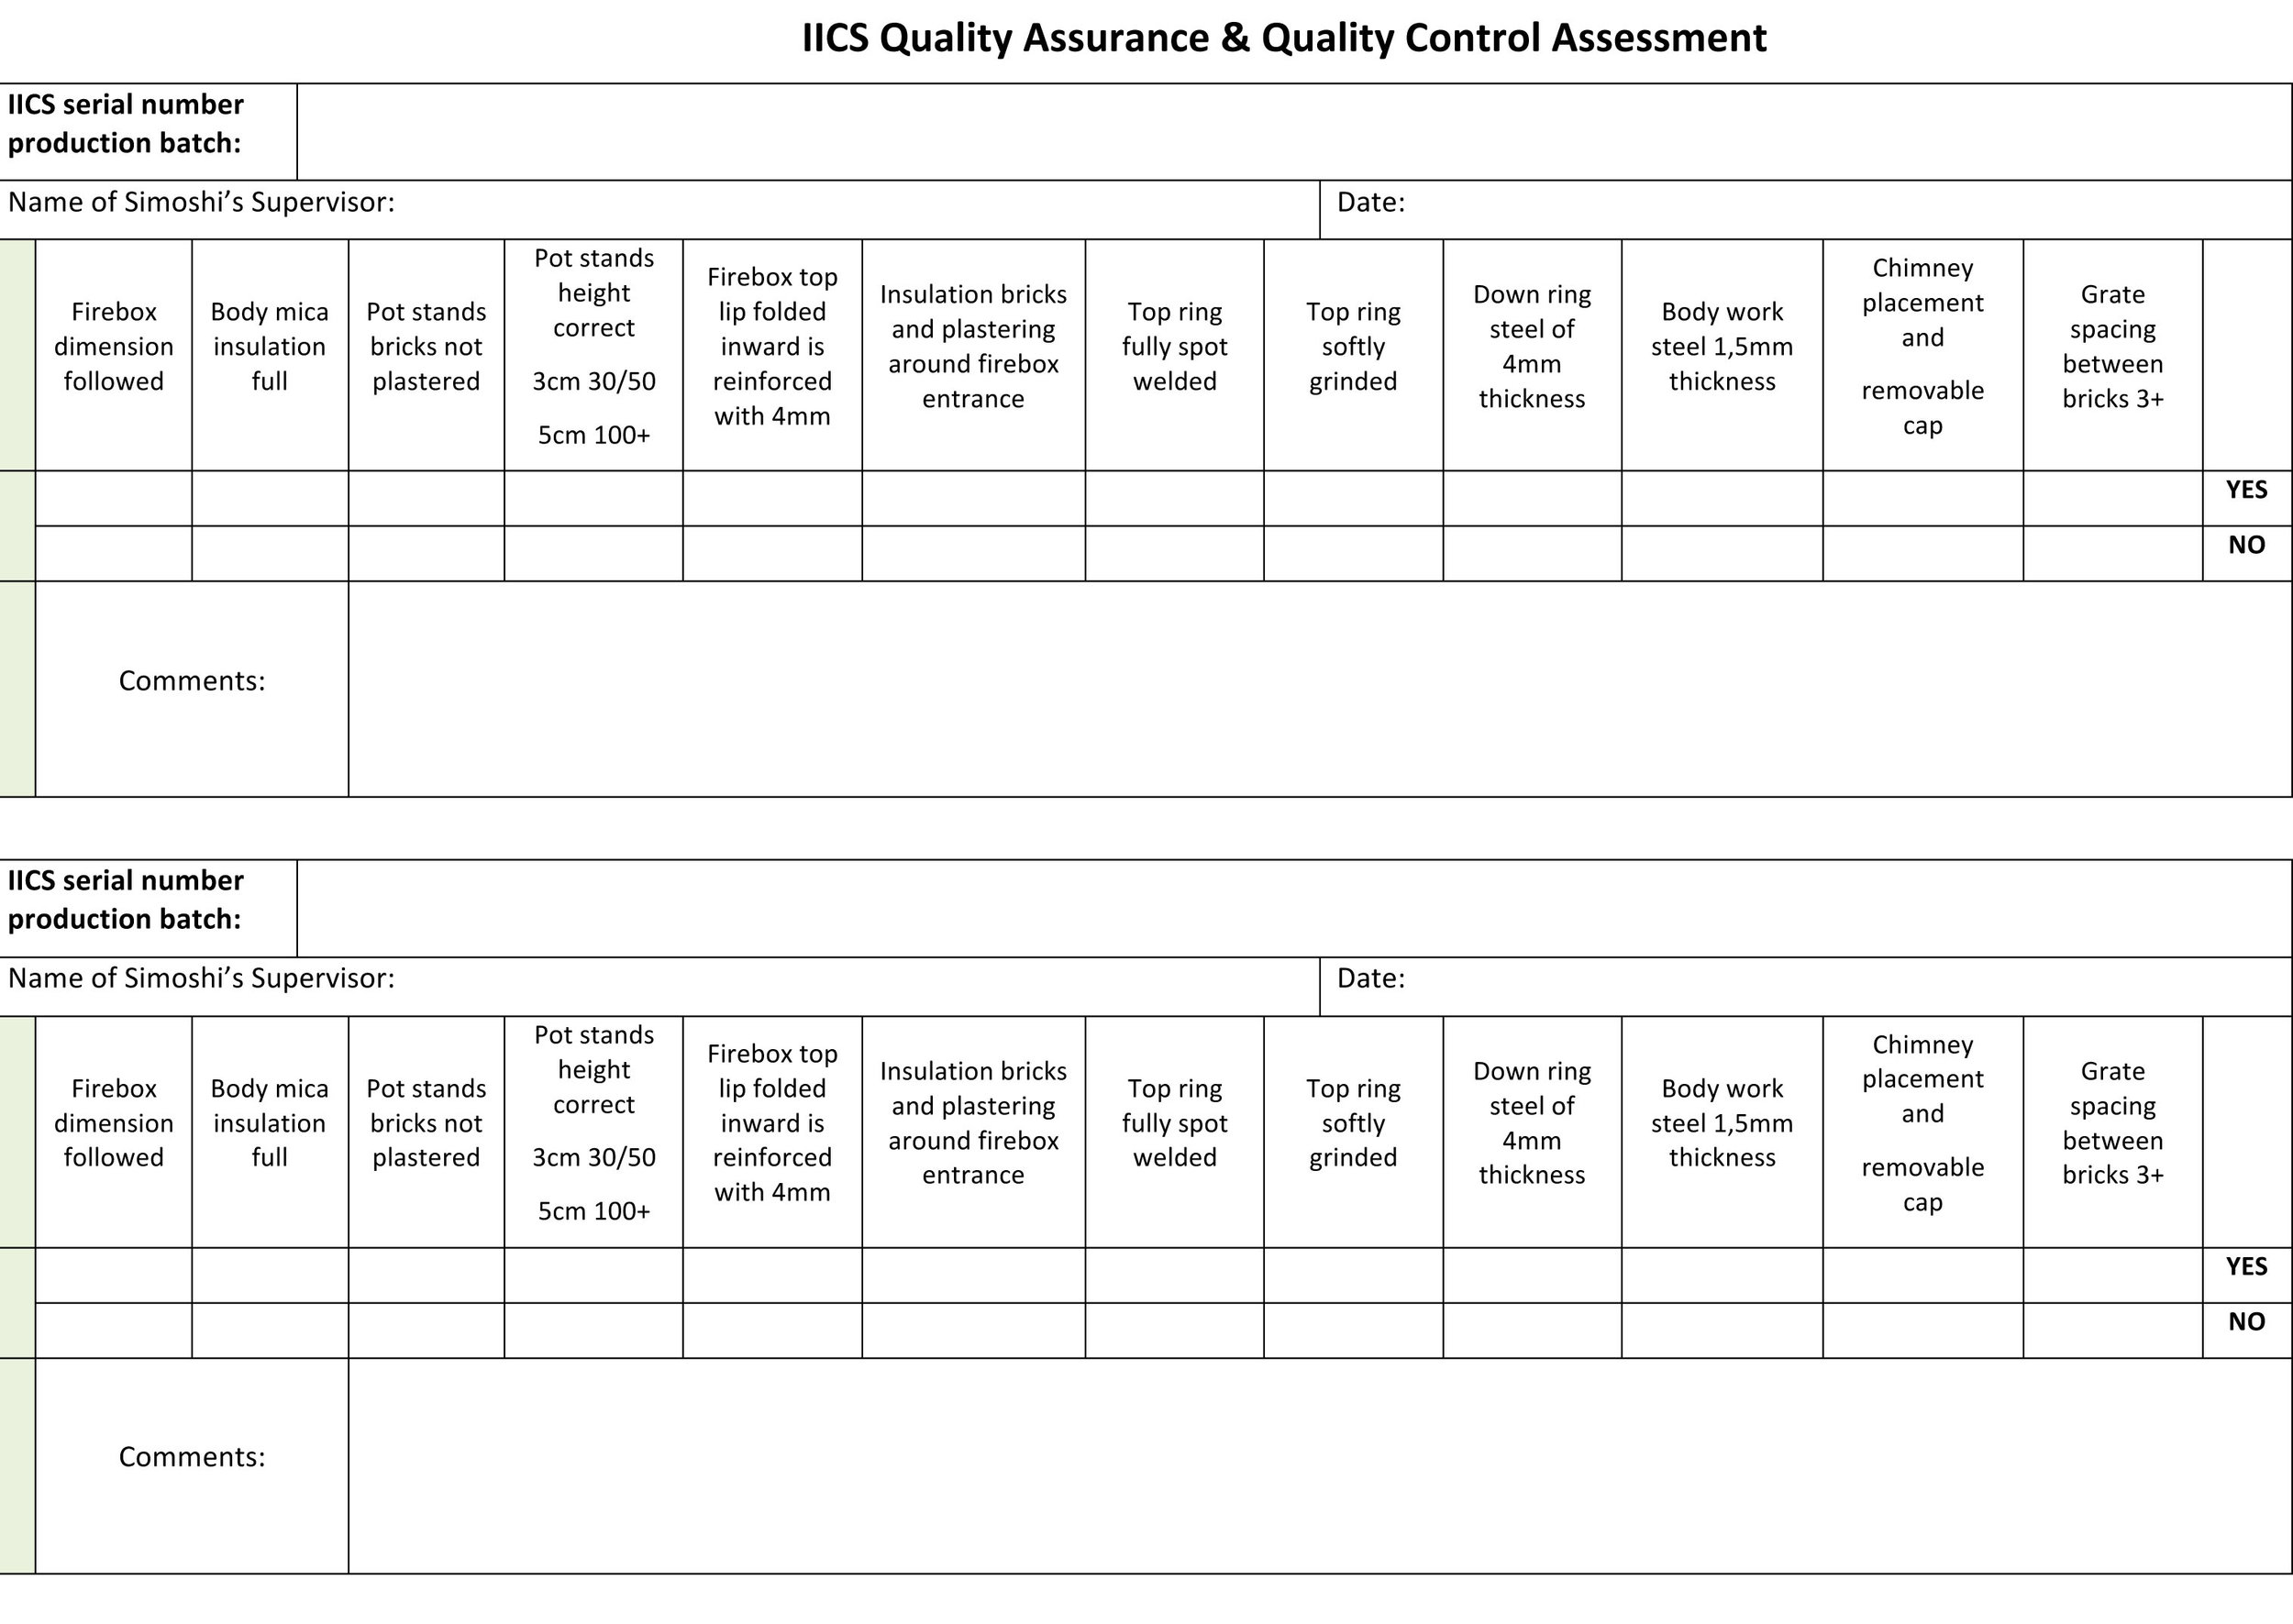 IICS Quality Assurance and Control Assessment